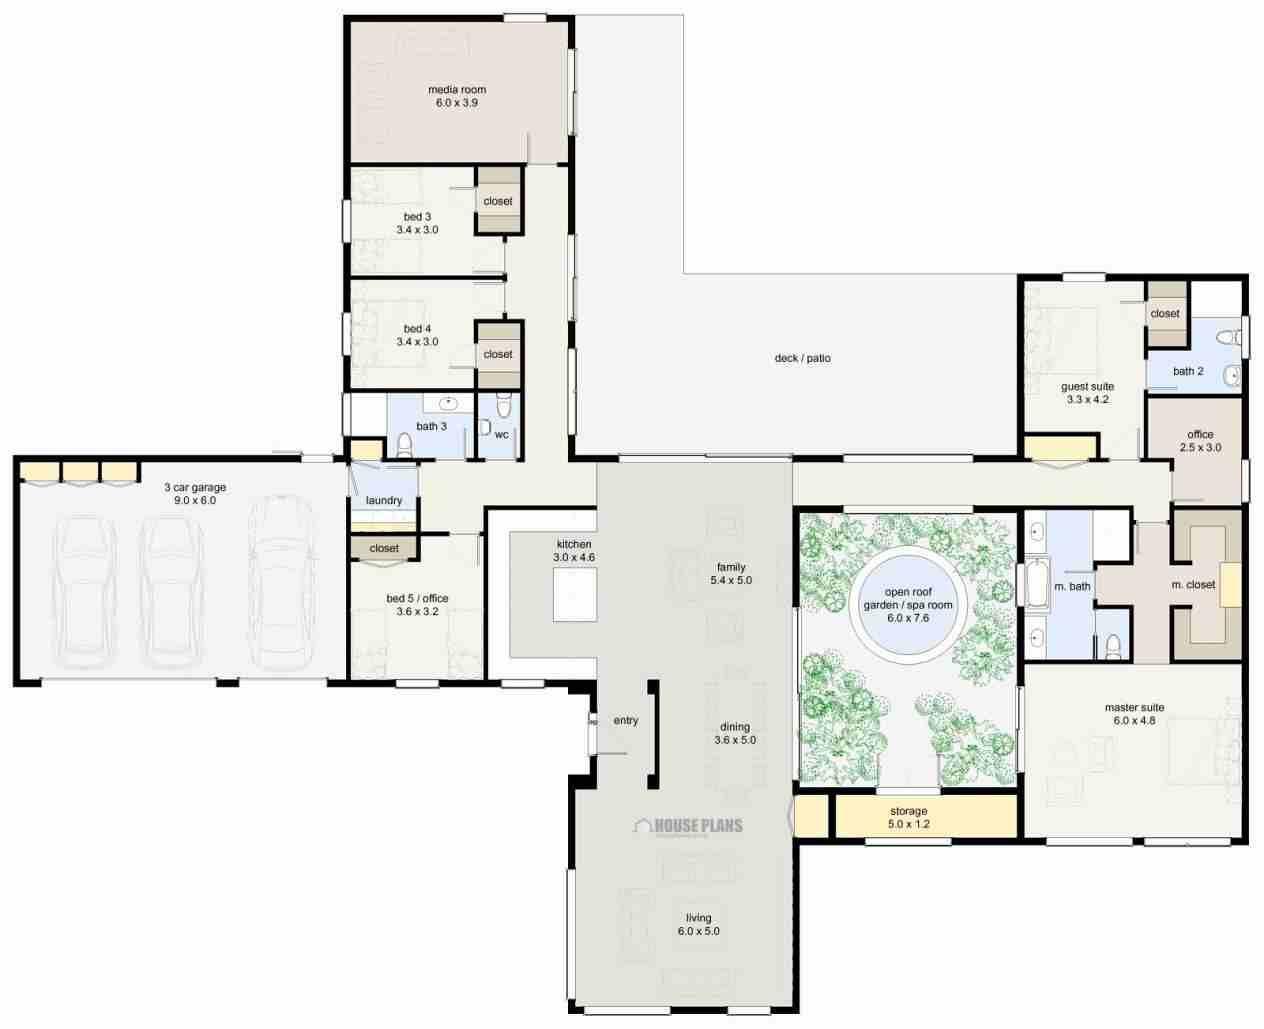 5 Bedroom Bungalow House Plans House Plans New House Plans